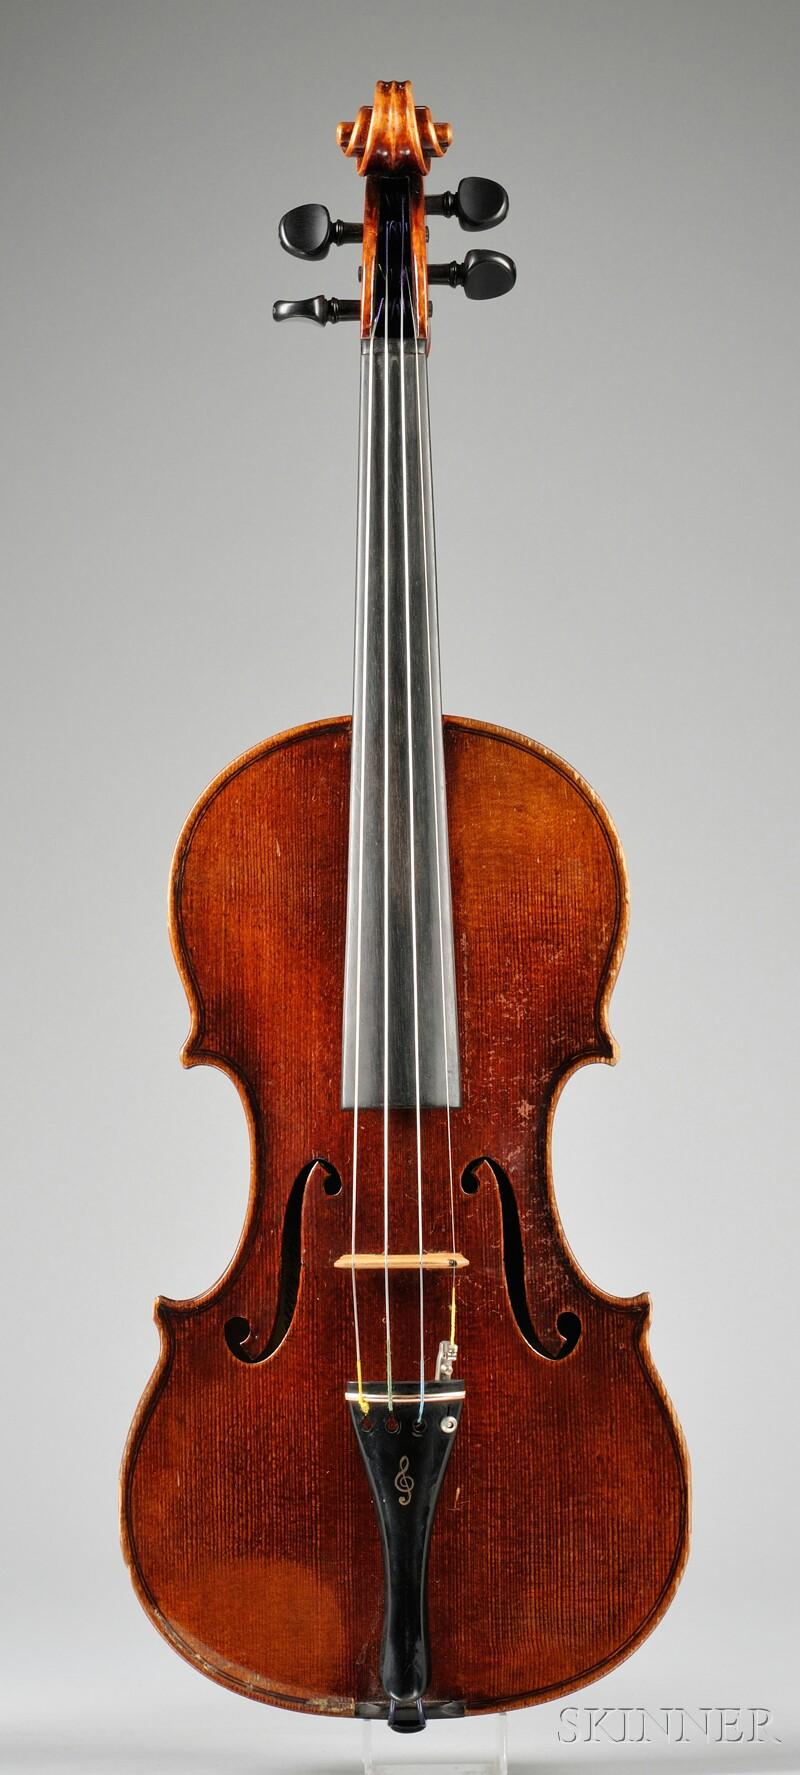 Markneukirchen Violin, Paul Knorr, 1925